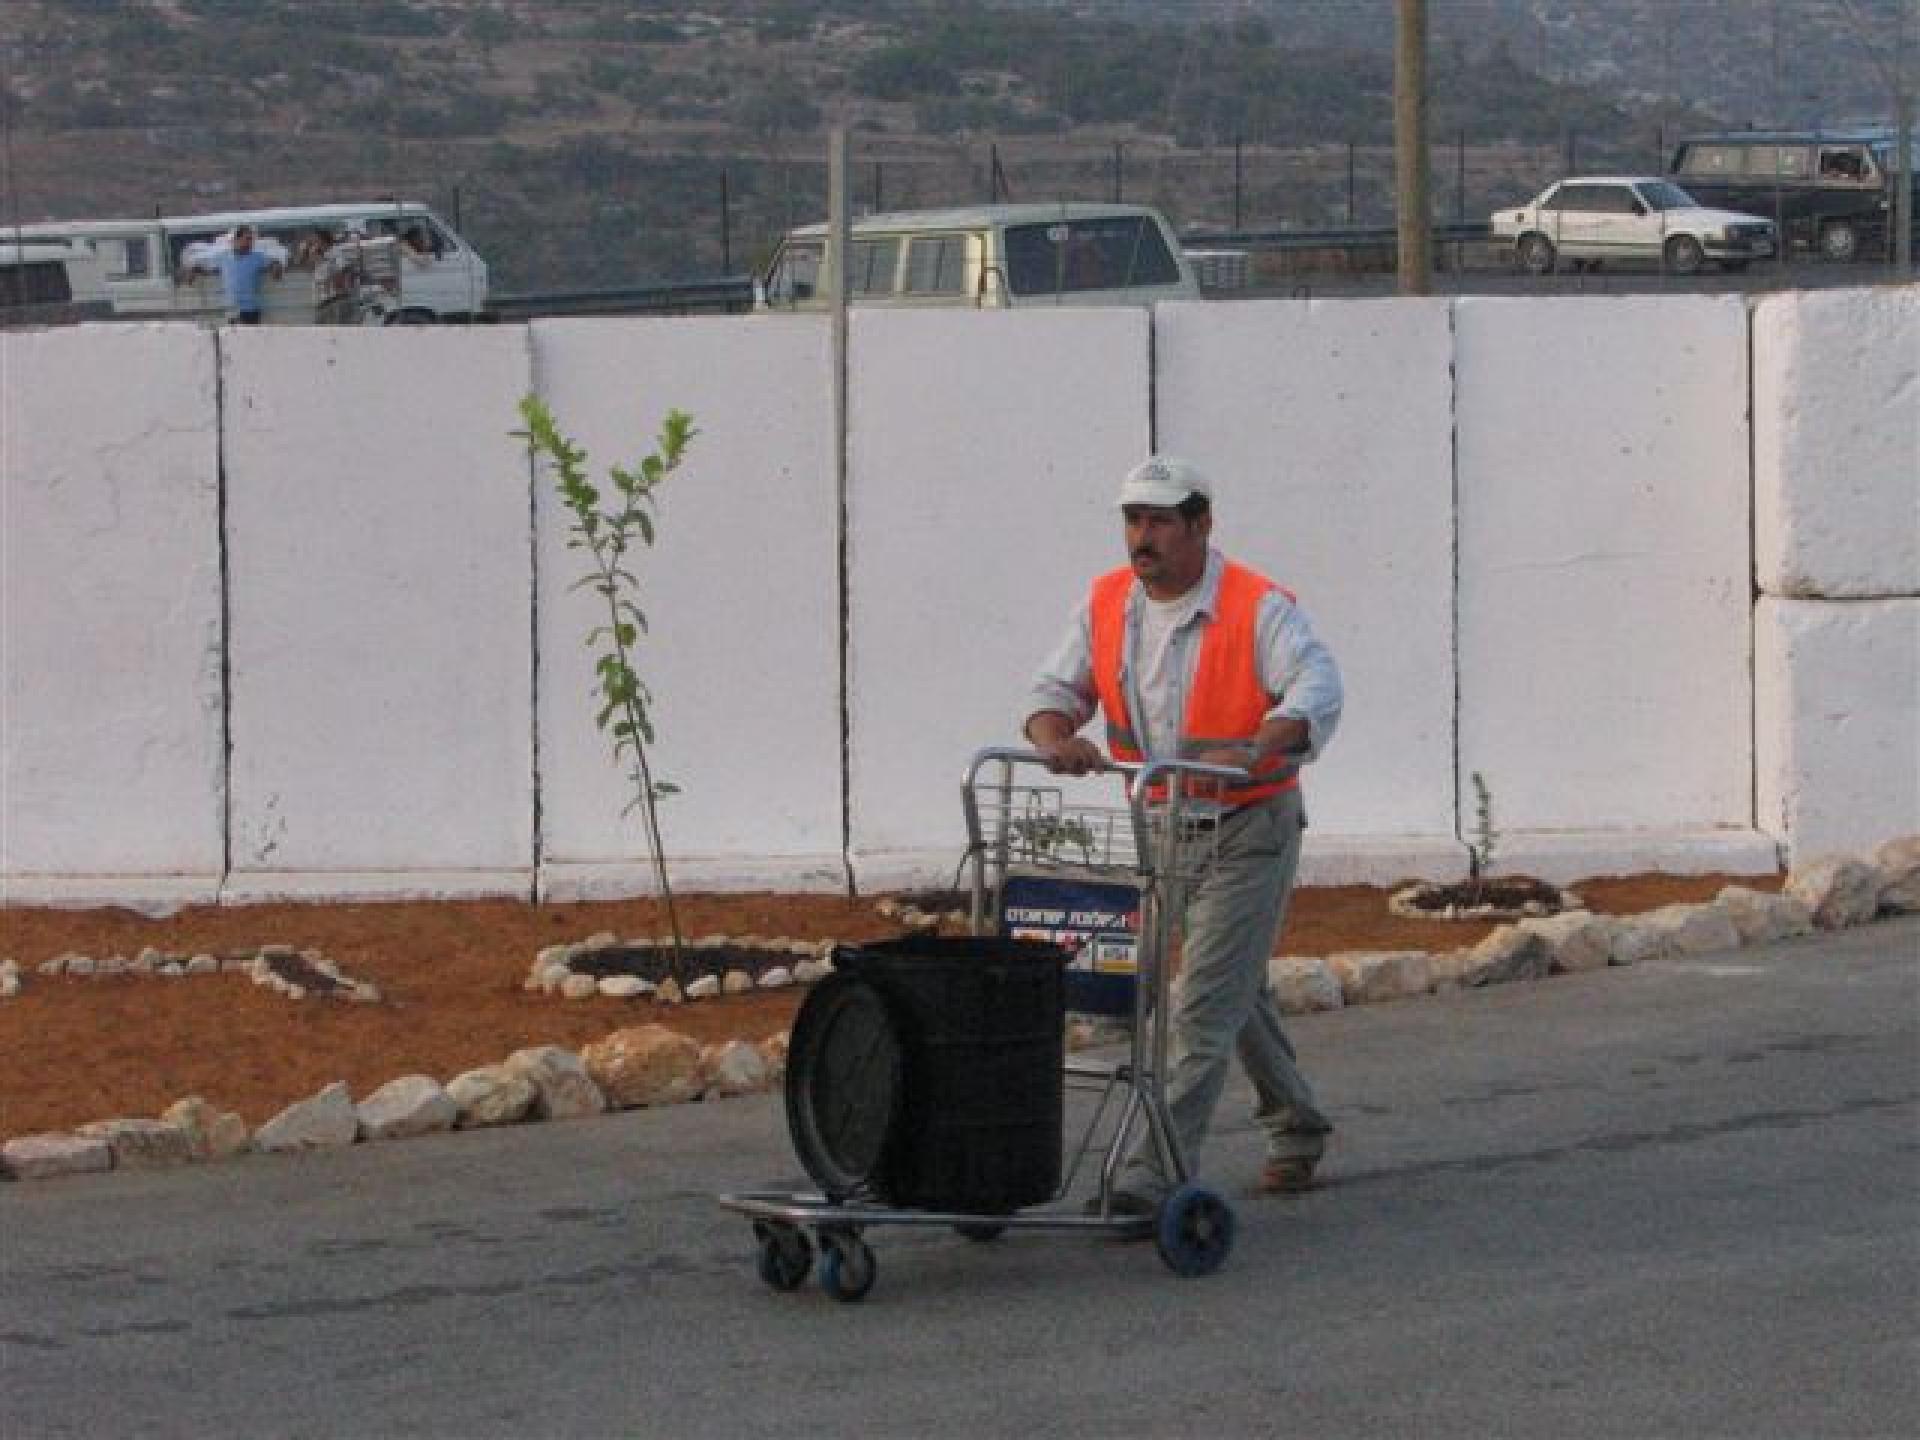 Barta'a/Reikhan checkpoint 09.10.07